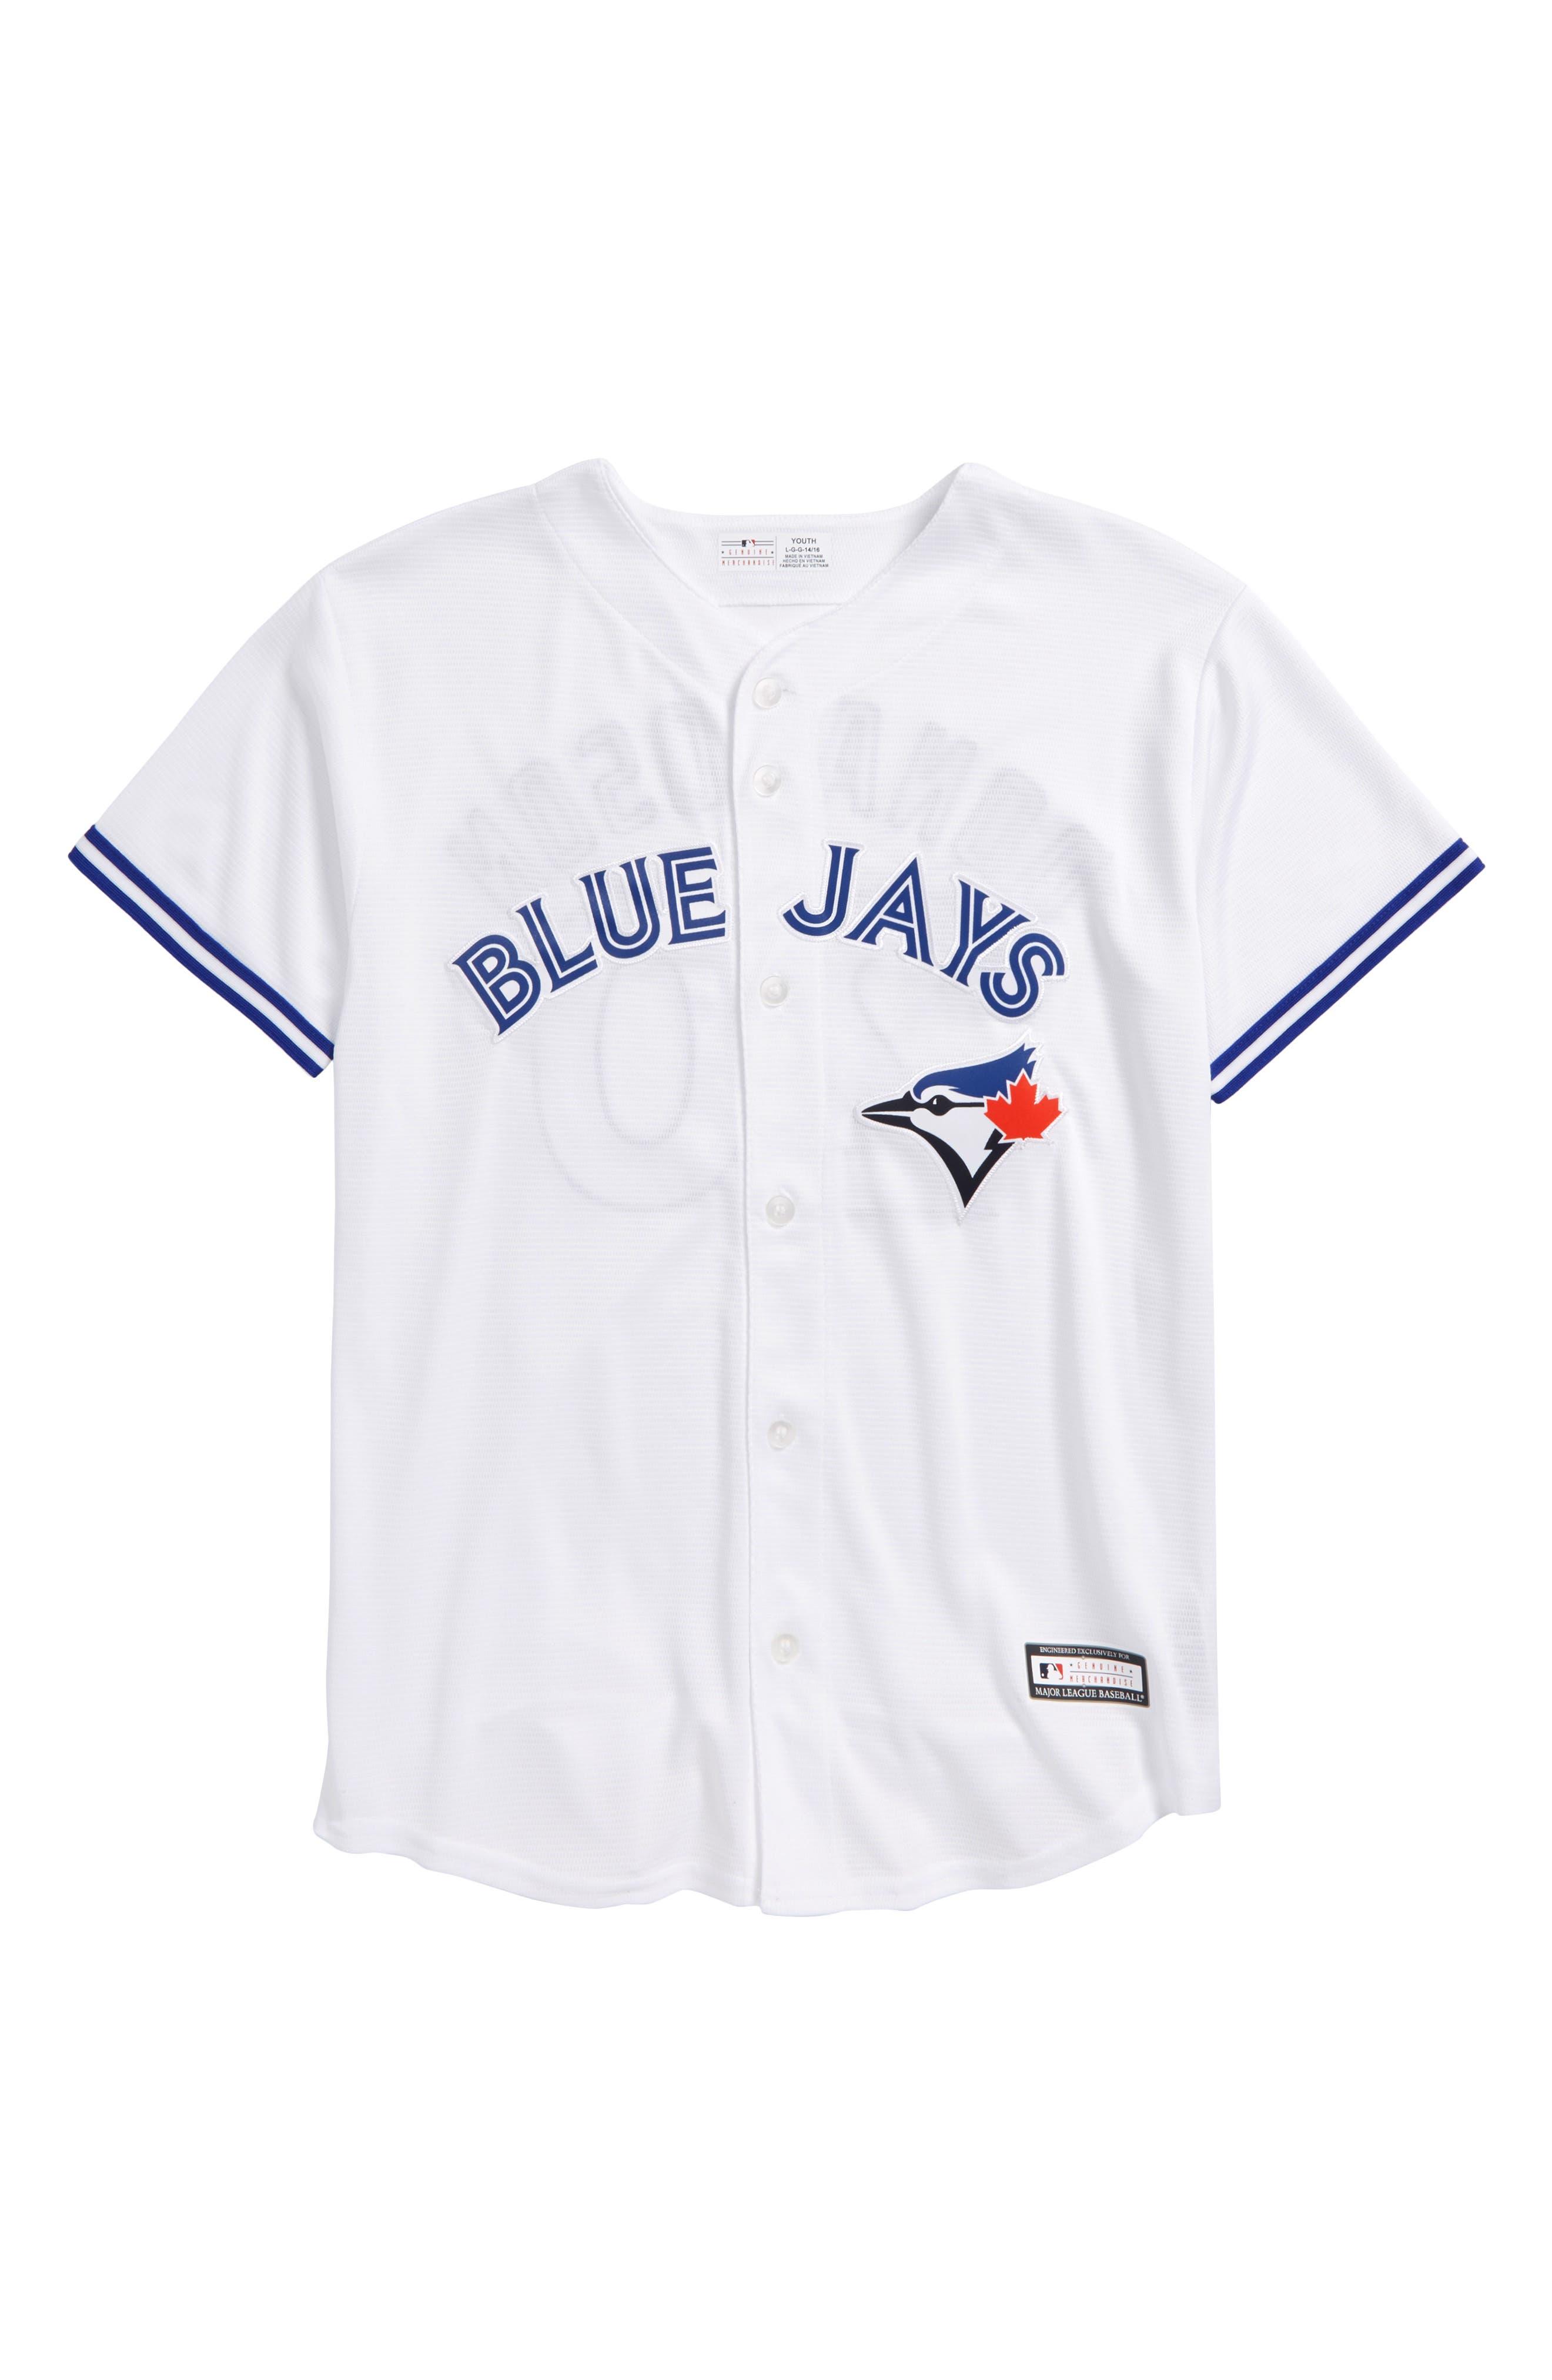 MAJESTIC MLB,                             Toronto Blue Jays - Josh Donaldson Baseball Jersey,                             Main thumbnail 1, color,                             100